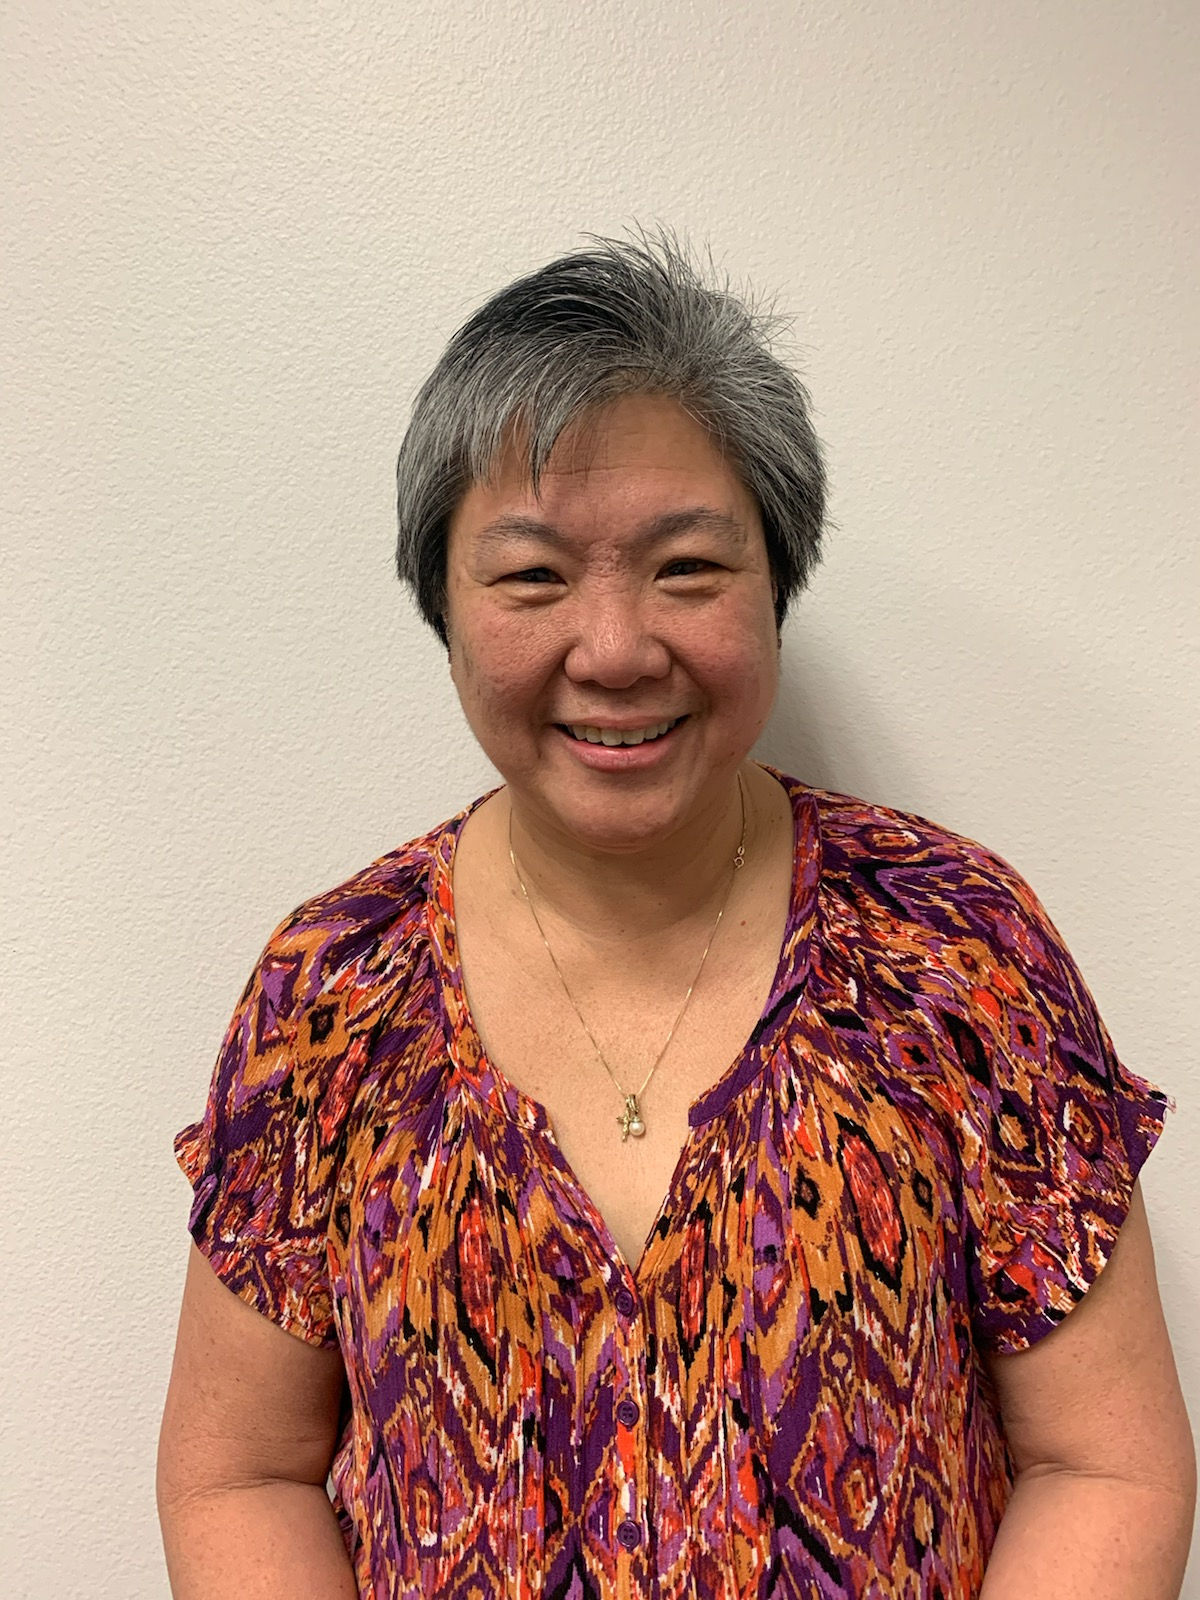 Neptune Society Service Administrator, Shari Lee